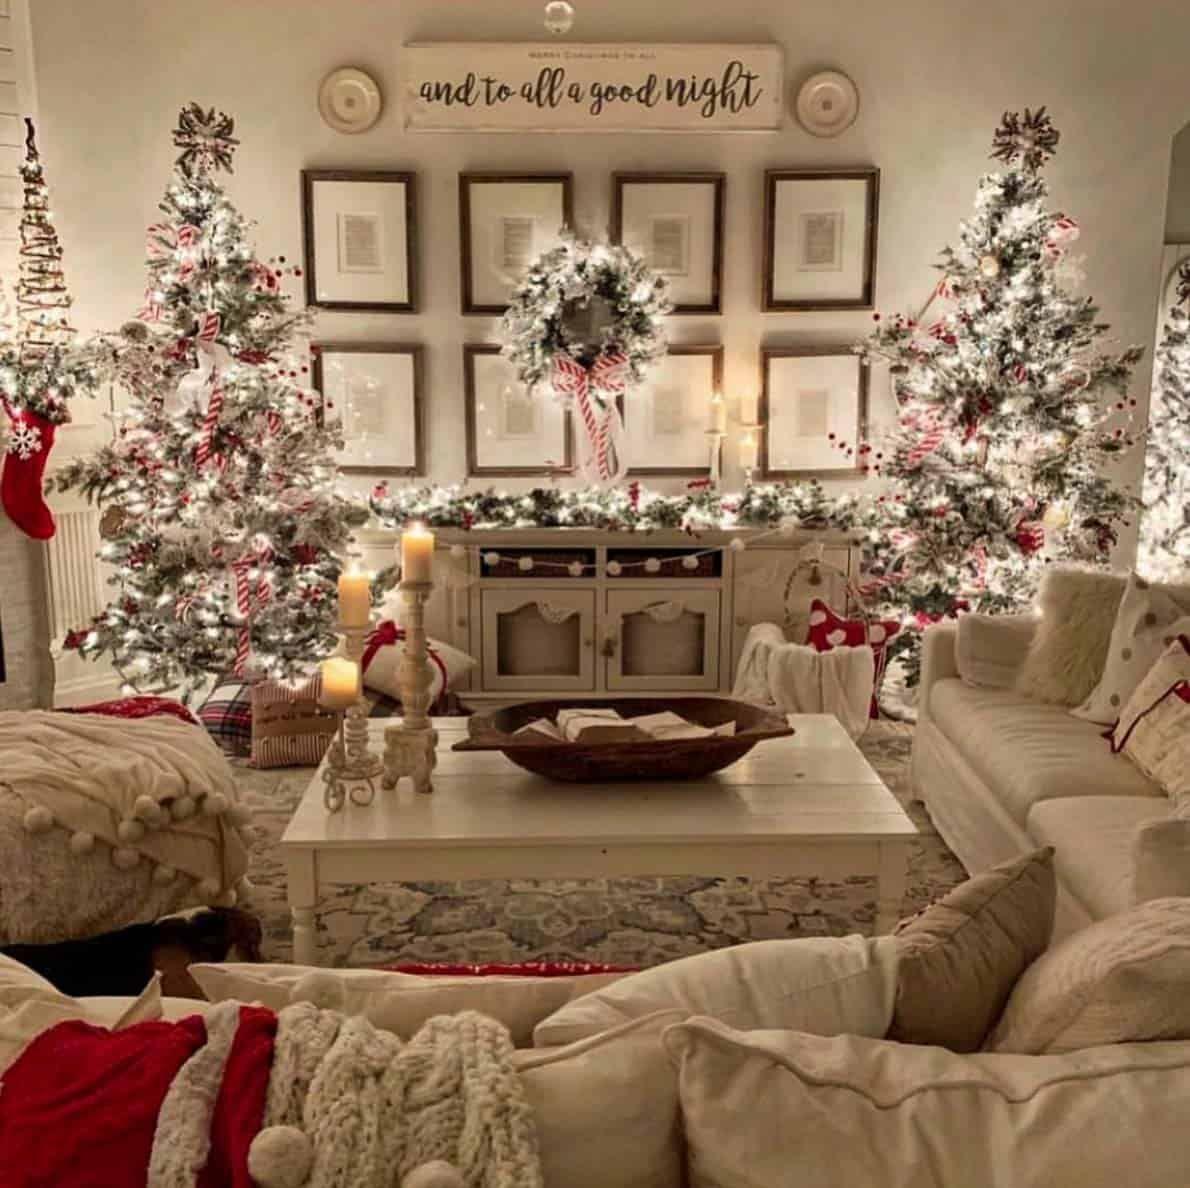 30+ Cozy And Wonderful Rustic Farmhouse Christmas